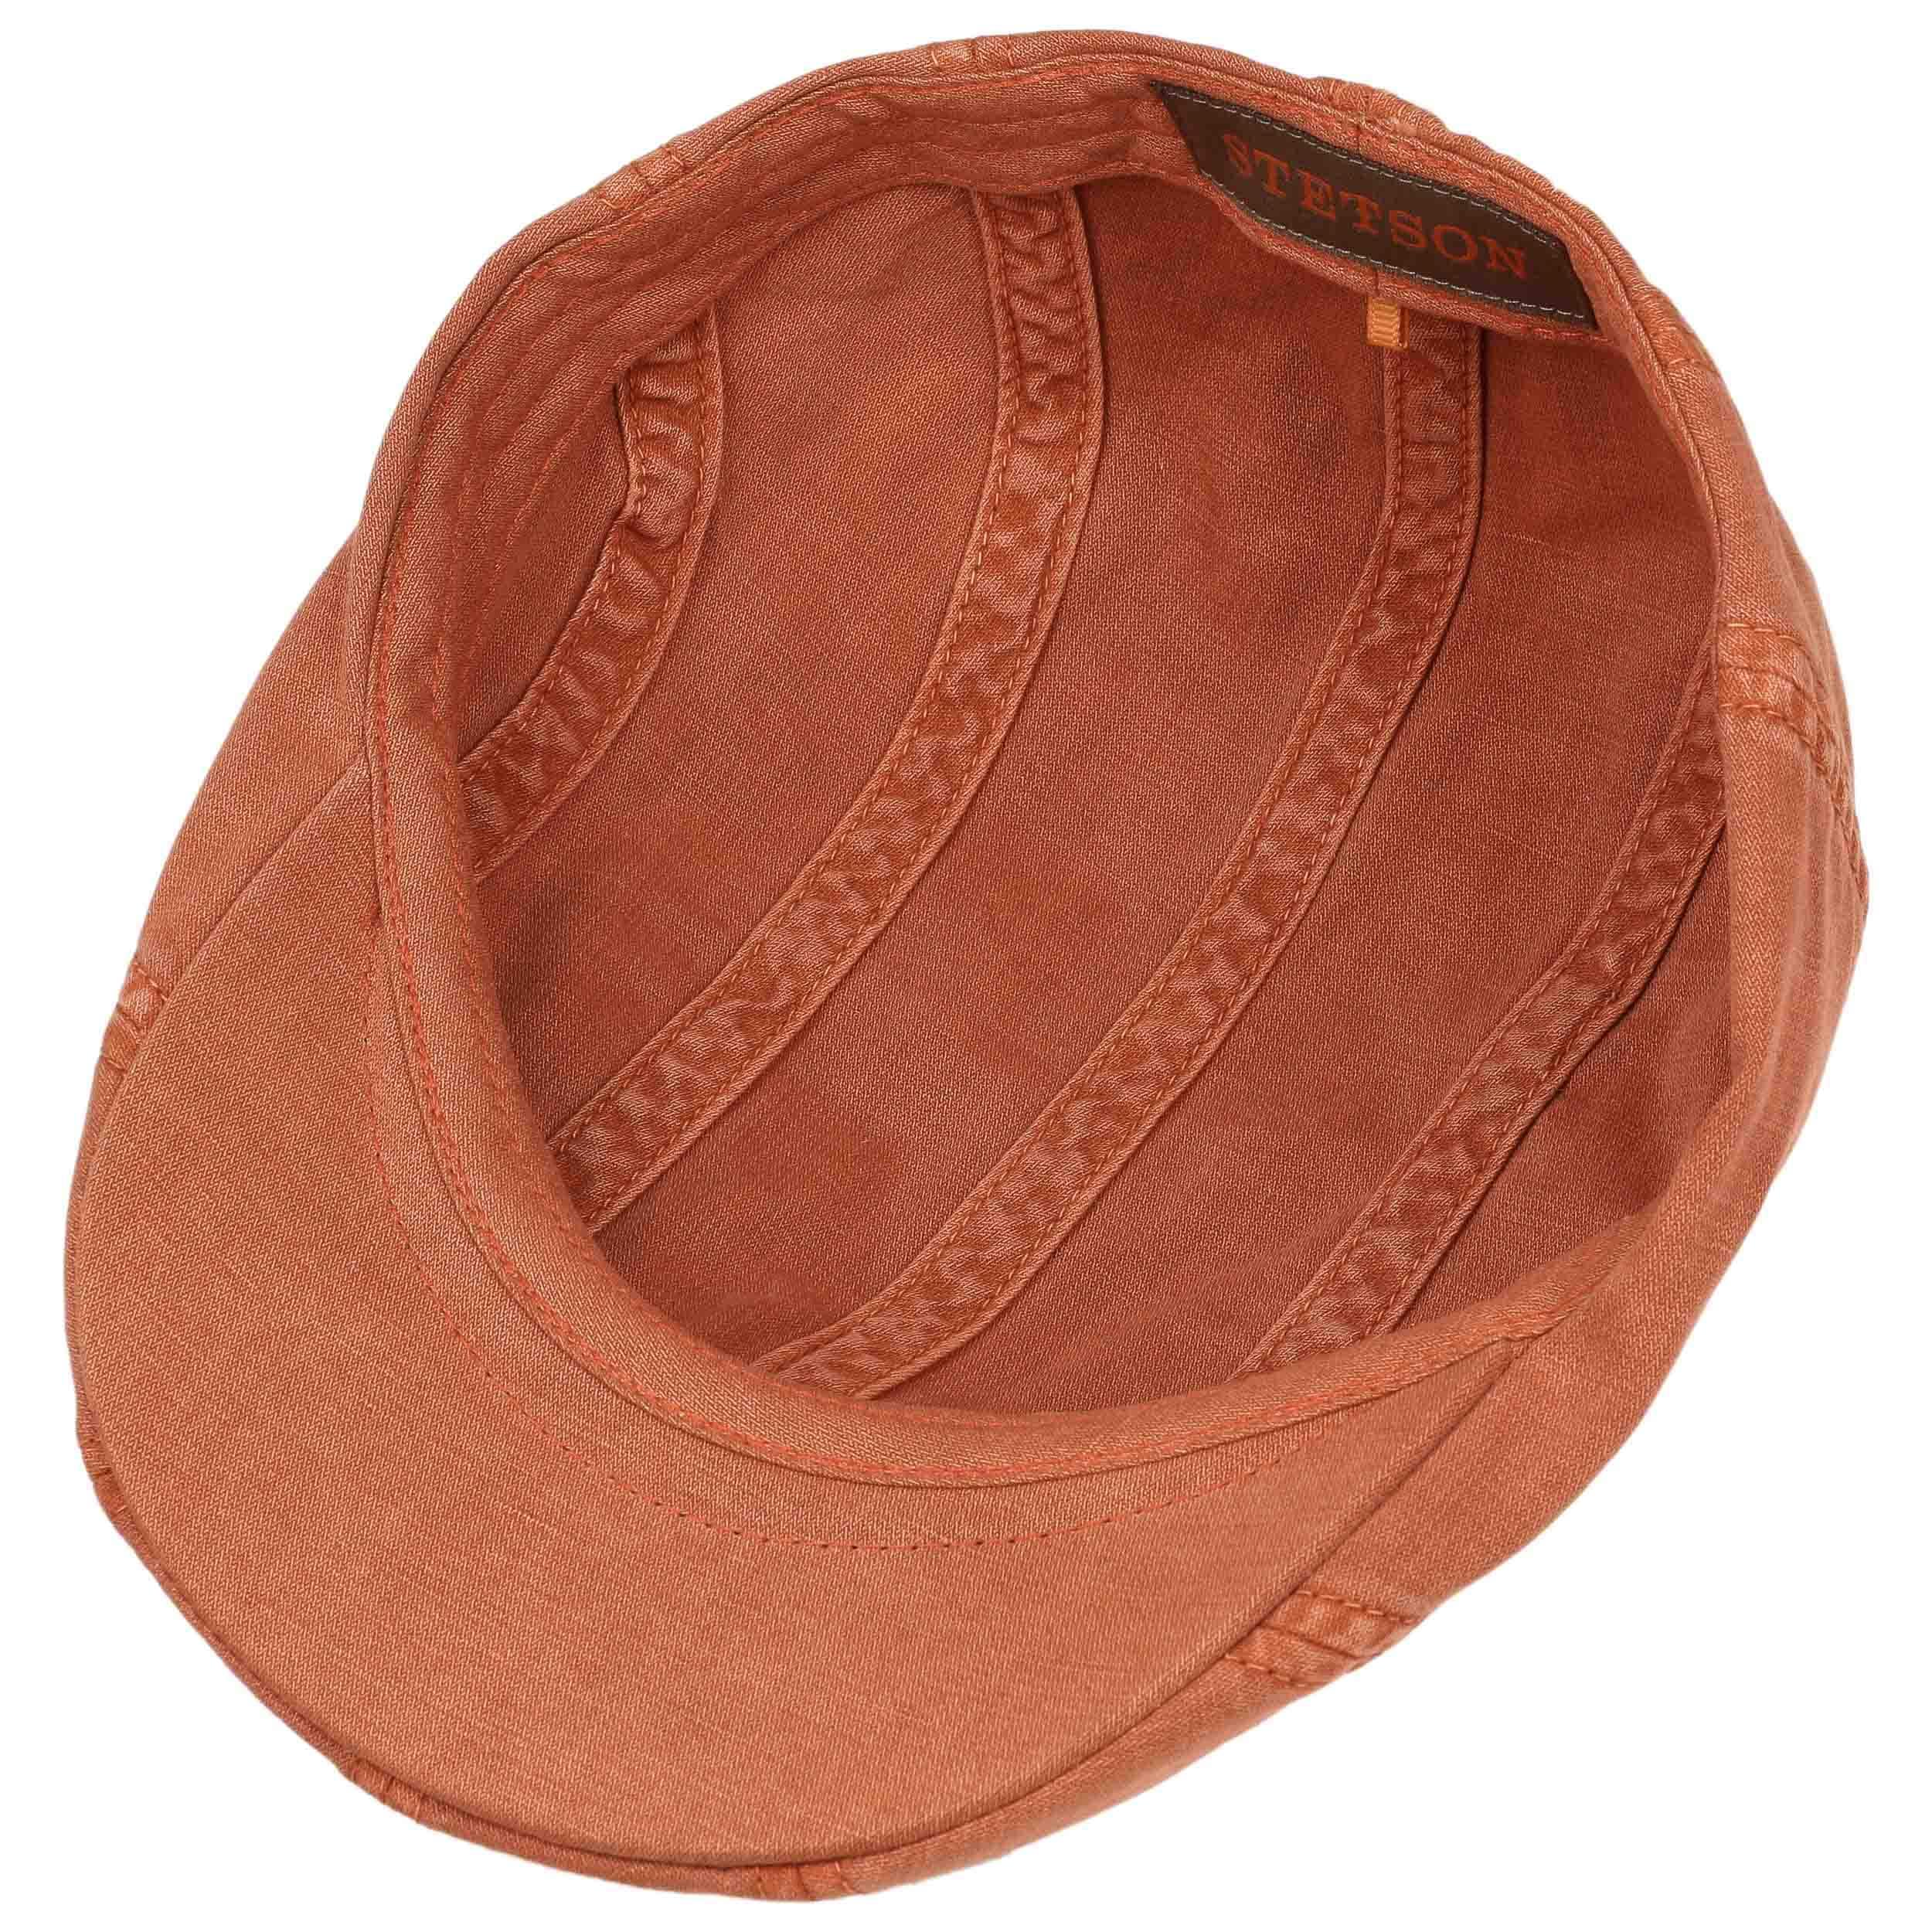 ... Madison Dye Flat Cap by Stetson - orange 2 ... 39ddab3eeb3a